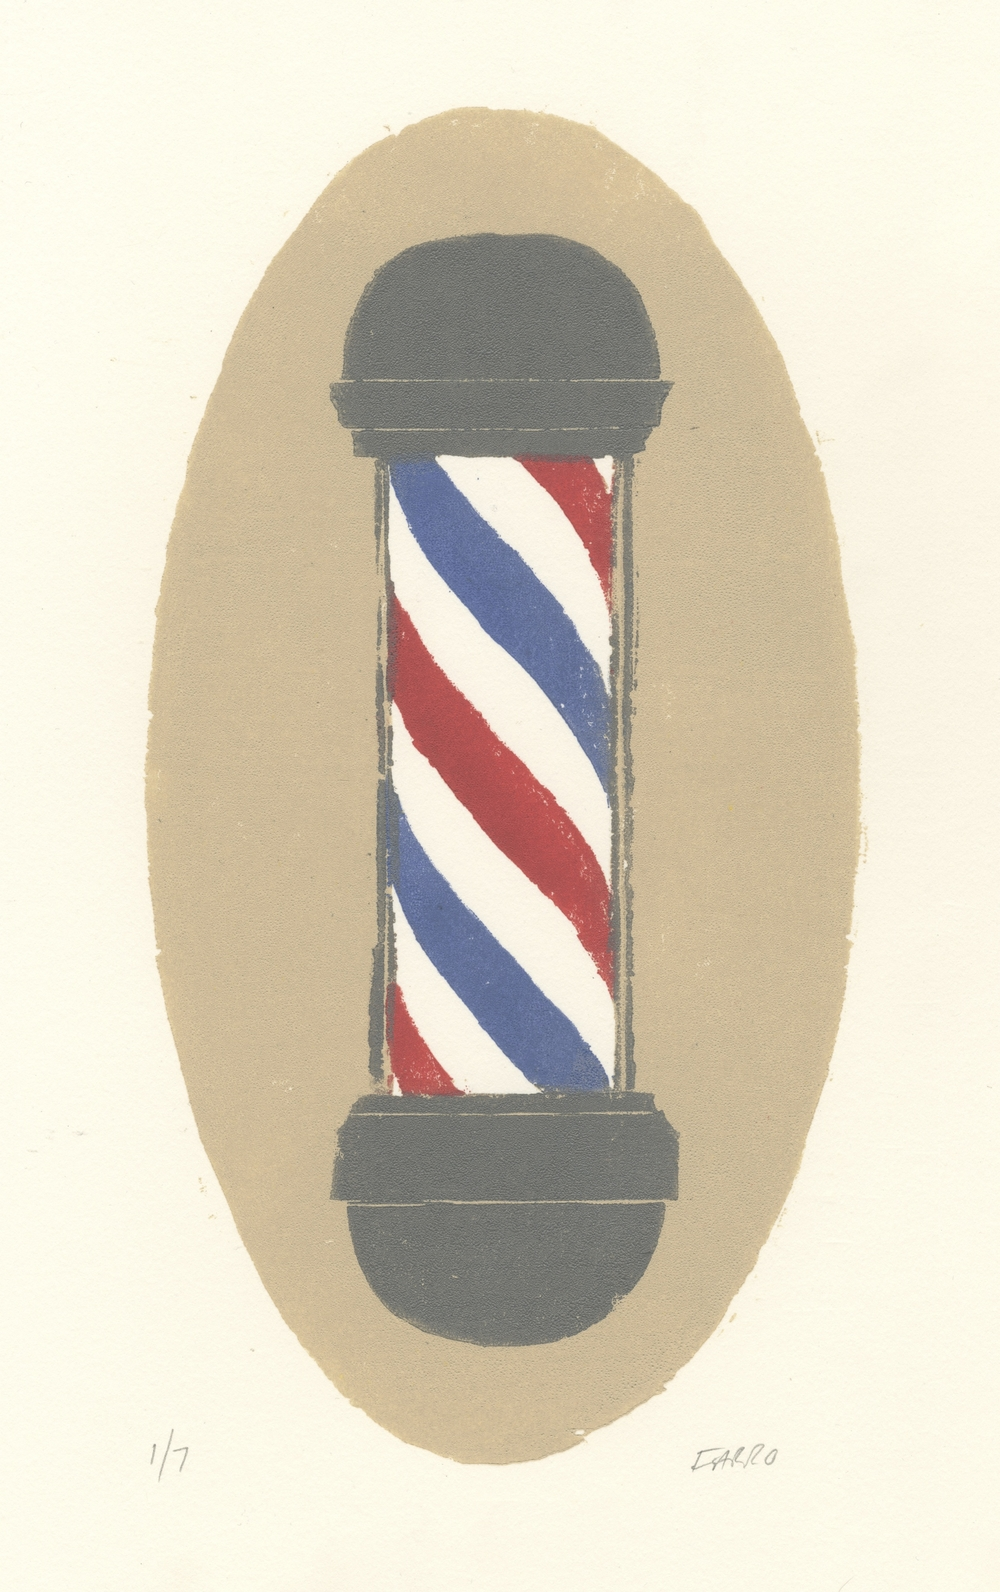 "barber pole   woodblock print  edition of 7  5.5x10.5""  2012"